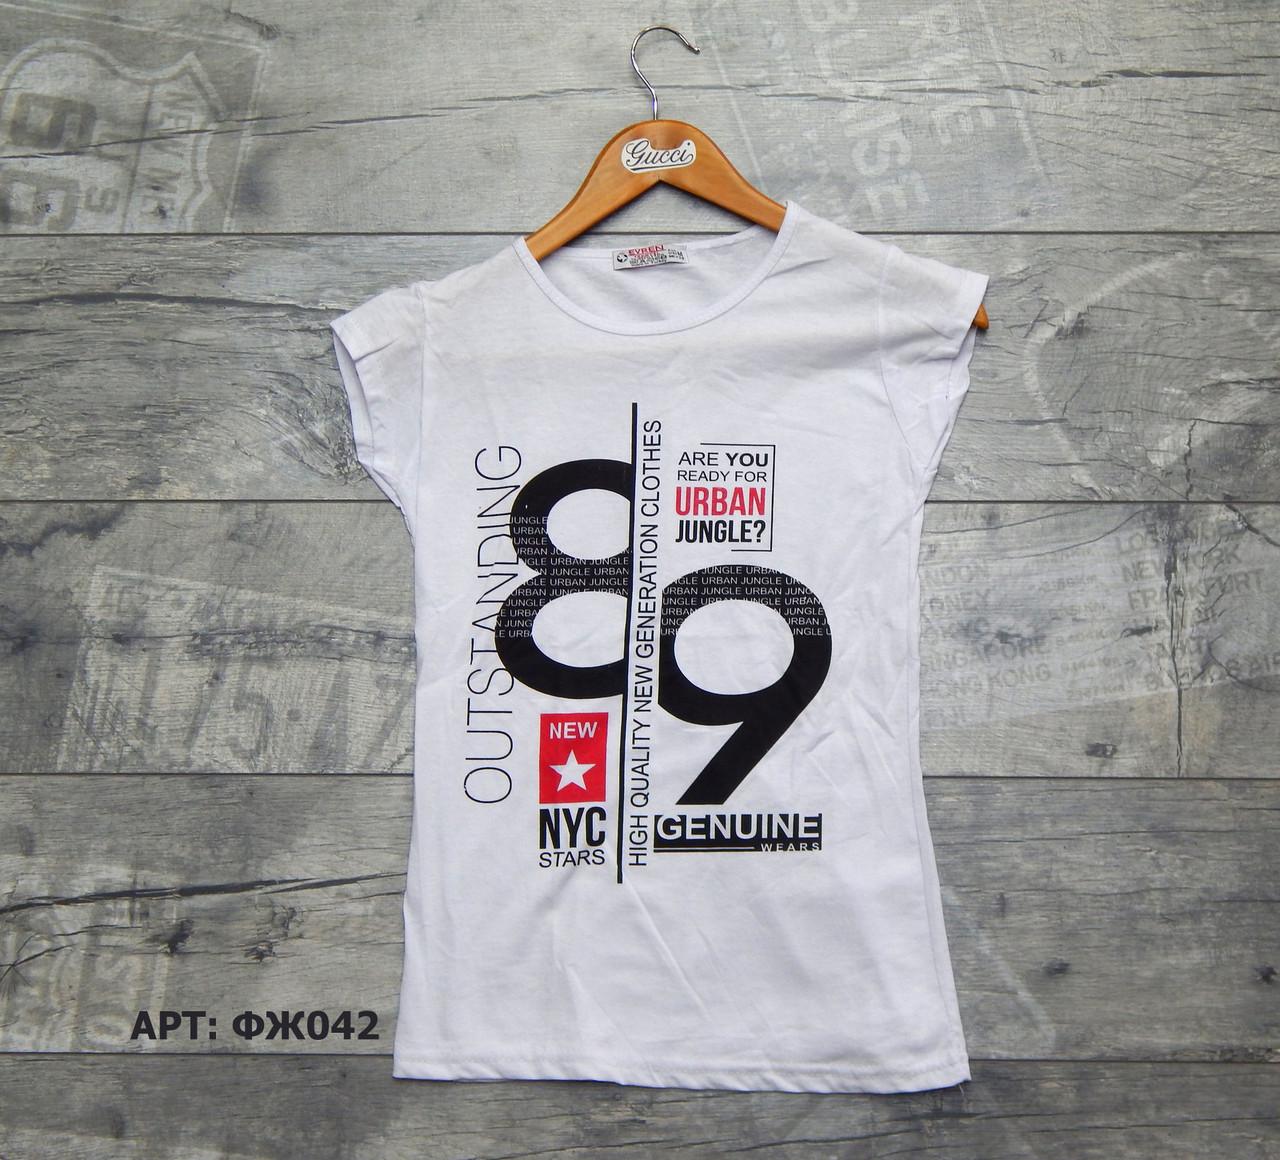 Женская футболка. Размеры: M/2XL